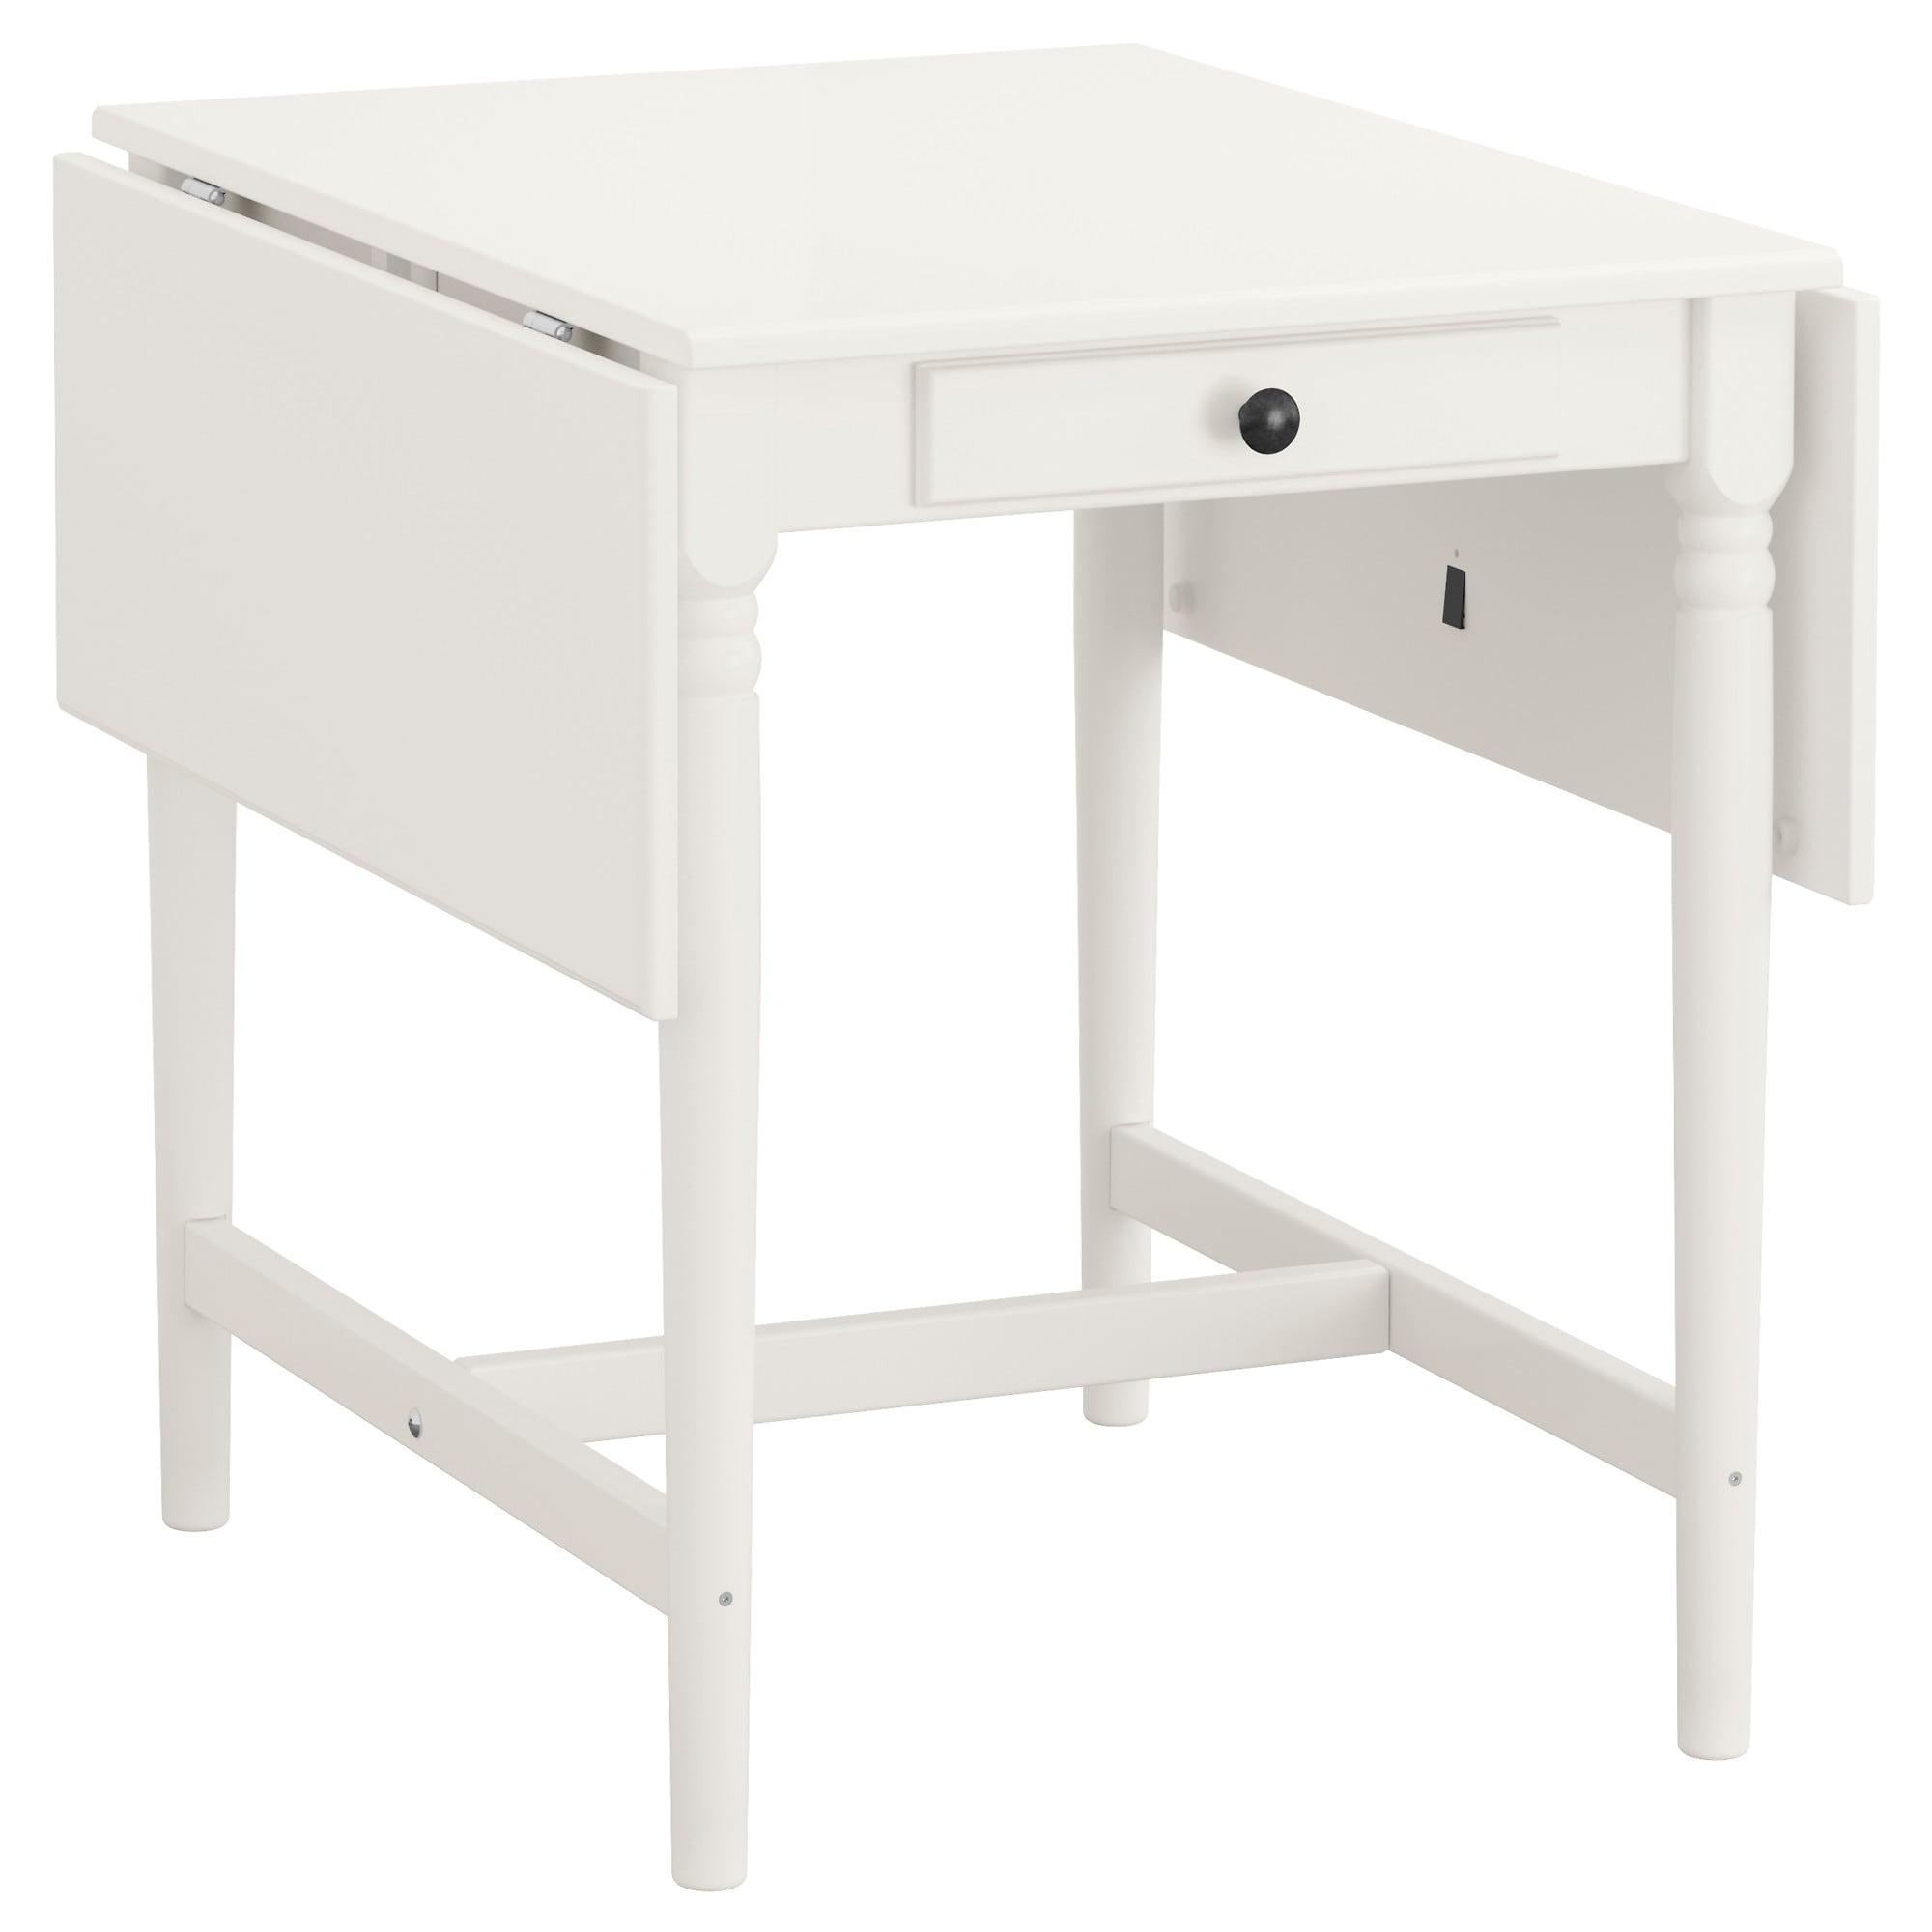 Mesa Plegable Cocina Ikea Txdf Mesas Plegables Extensibles Pra Online Ikea